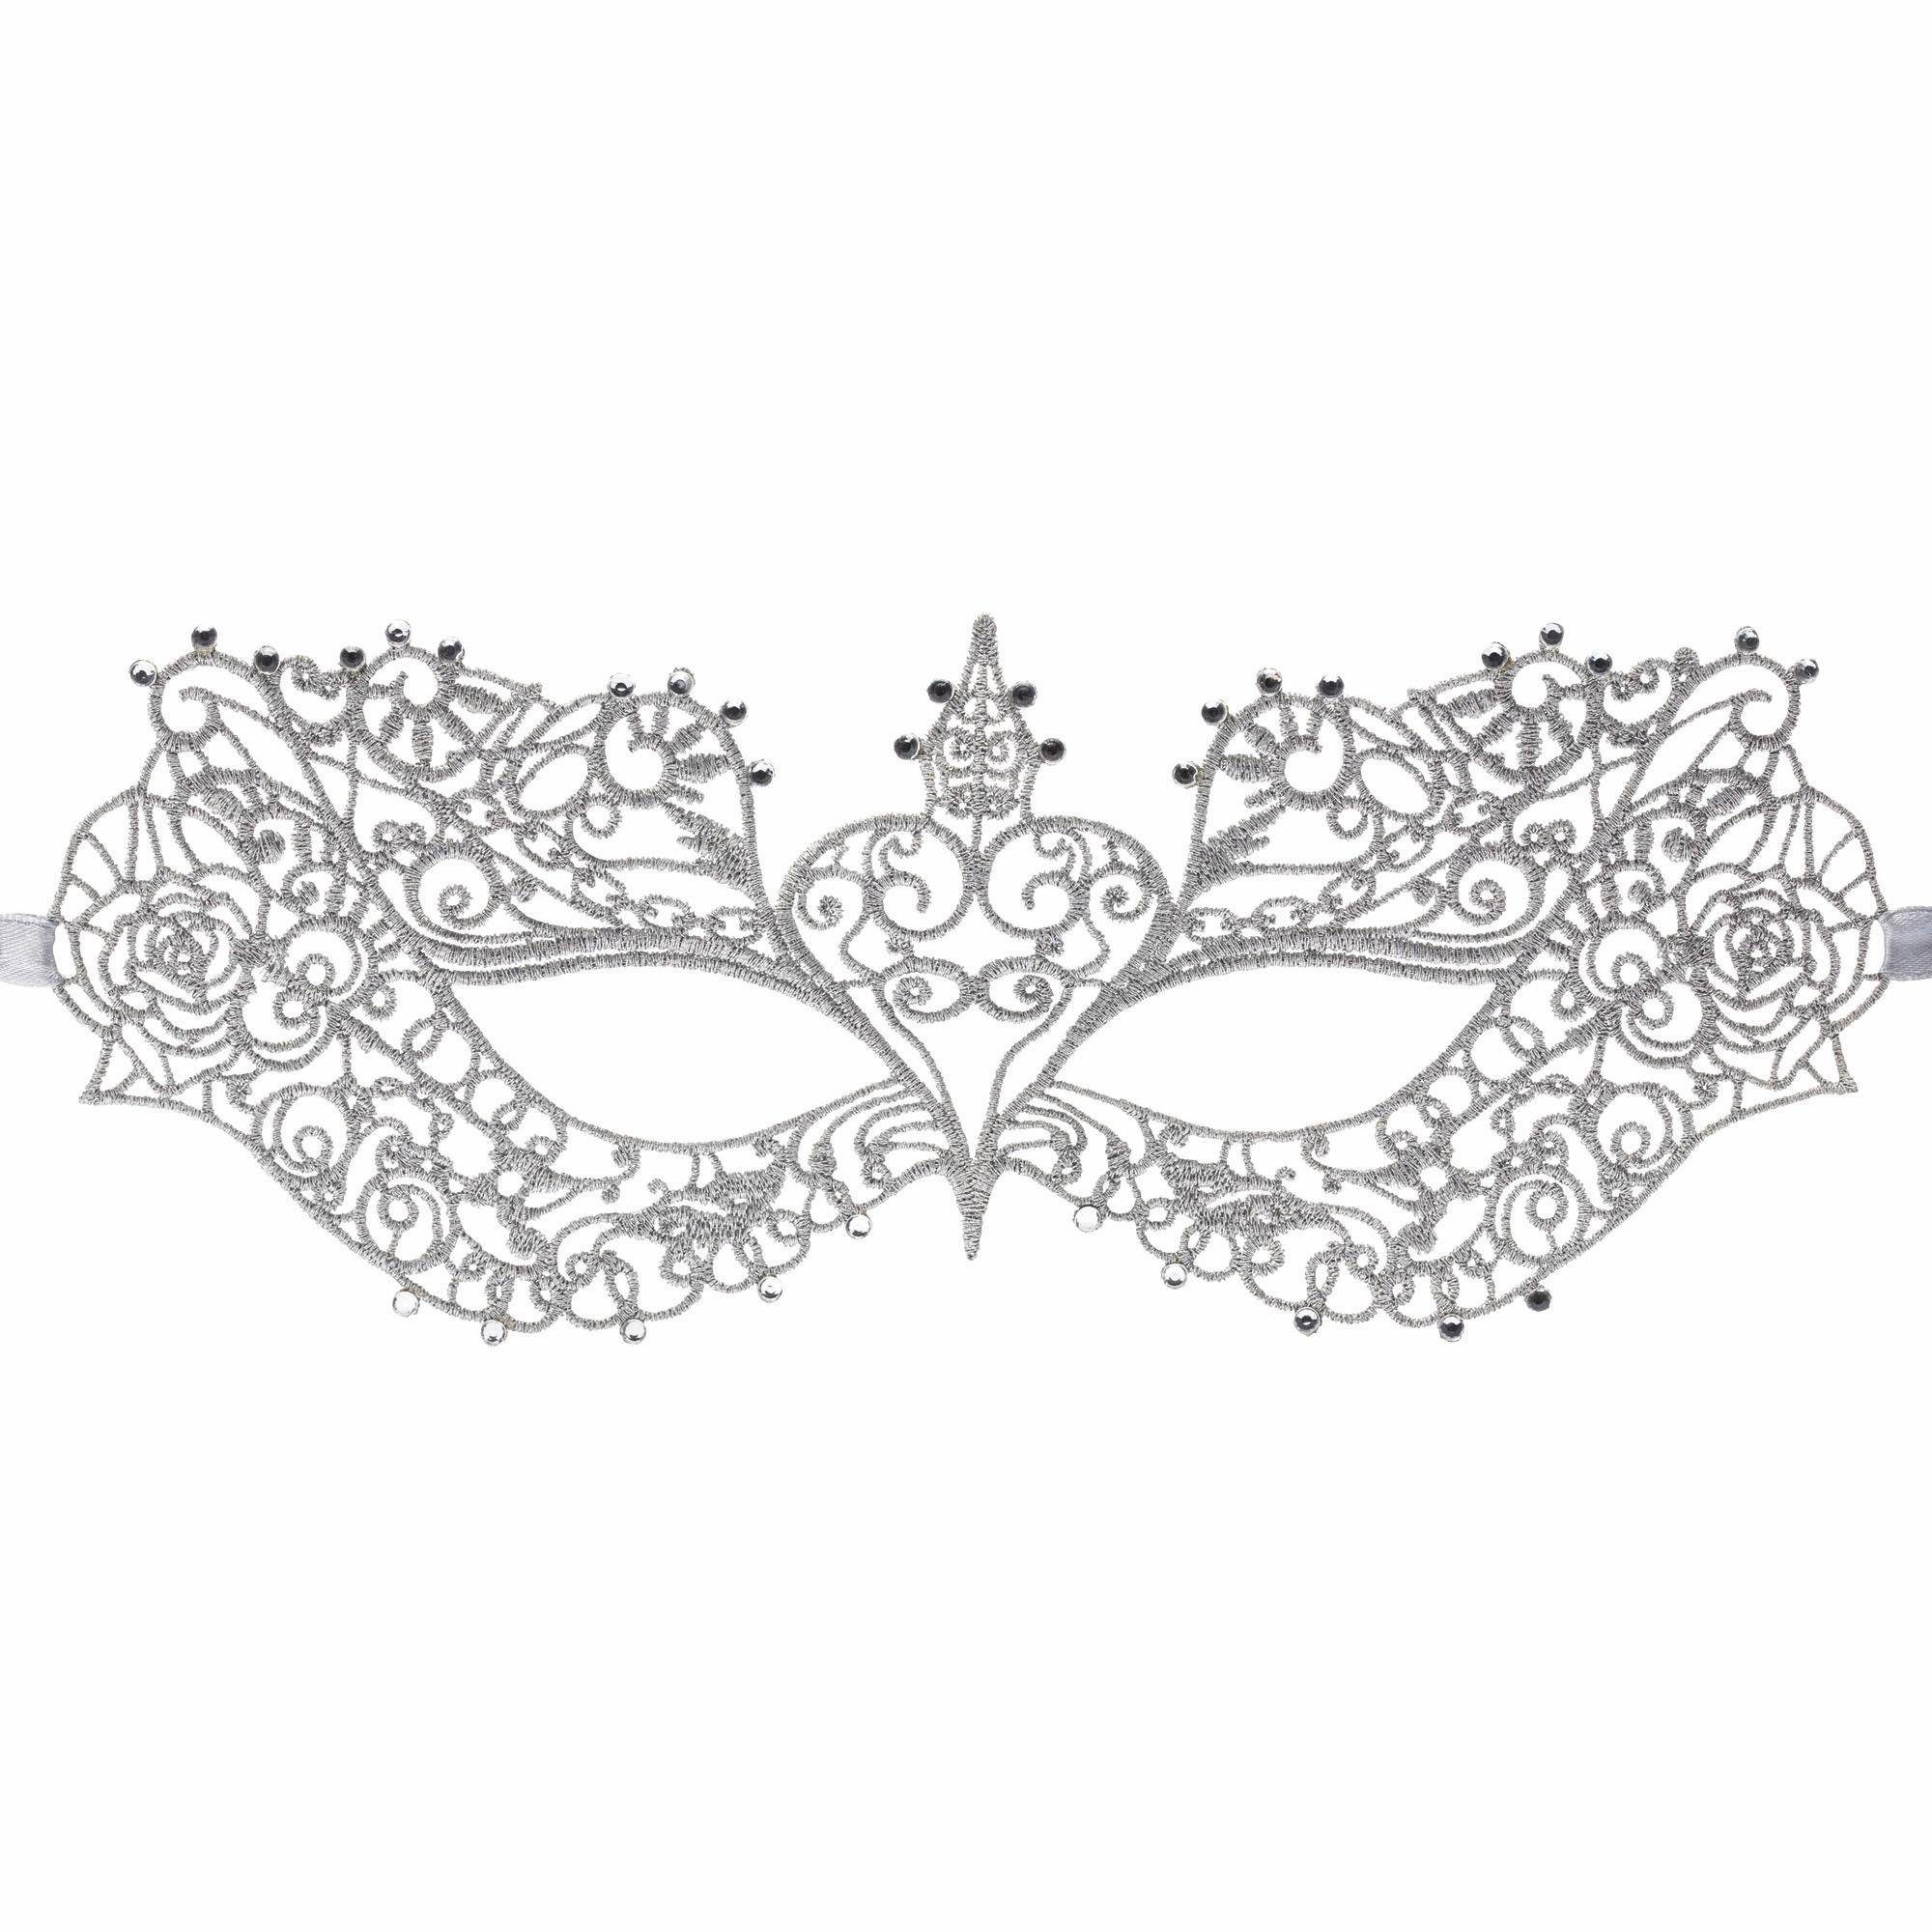 Shades of Grey Maske FSOGD Anastasia Masquerade Mas, 100% Polyester